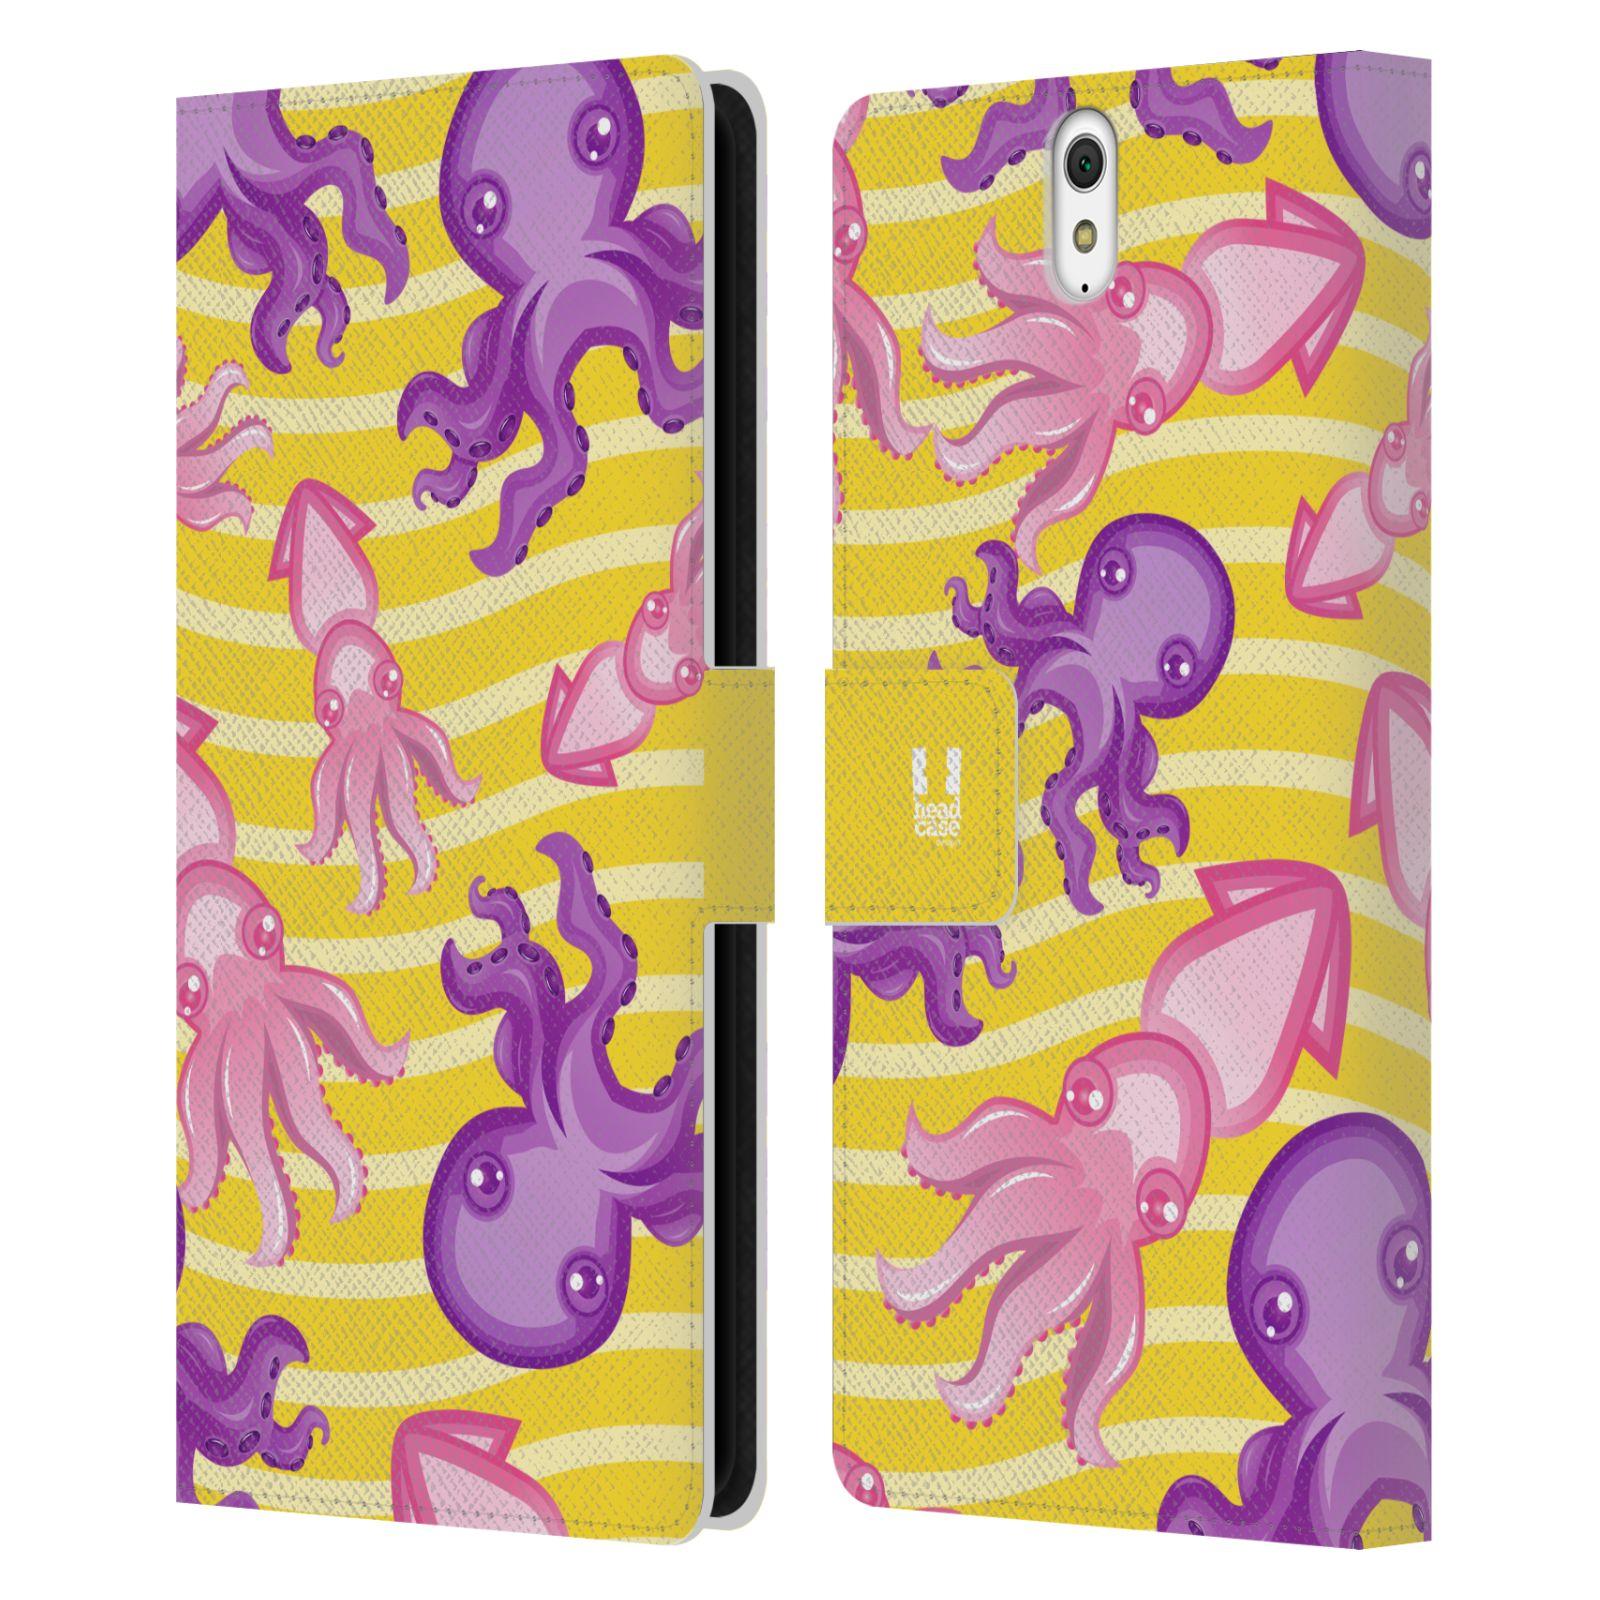 HEAD CASE Flipové pouzdro pro mobil SONY XPERIA C5 Ultra Mořský živočich chobotnice a krakatice žlutá barva